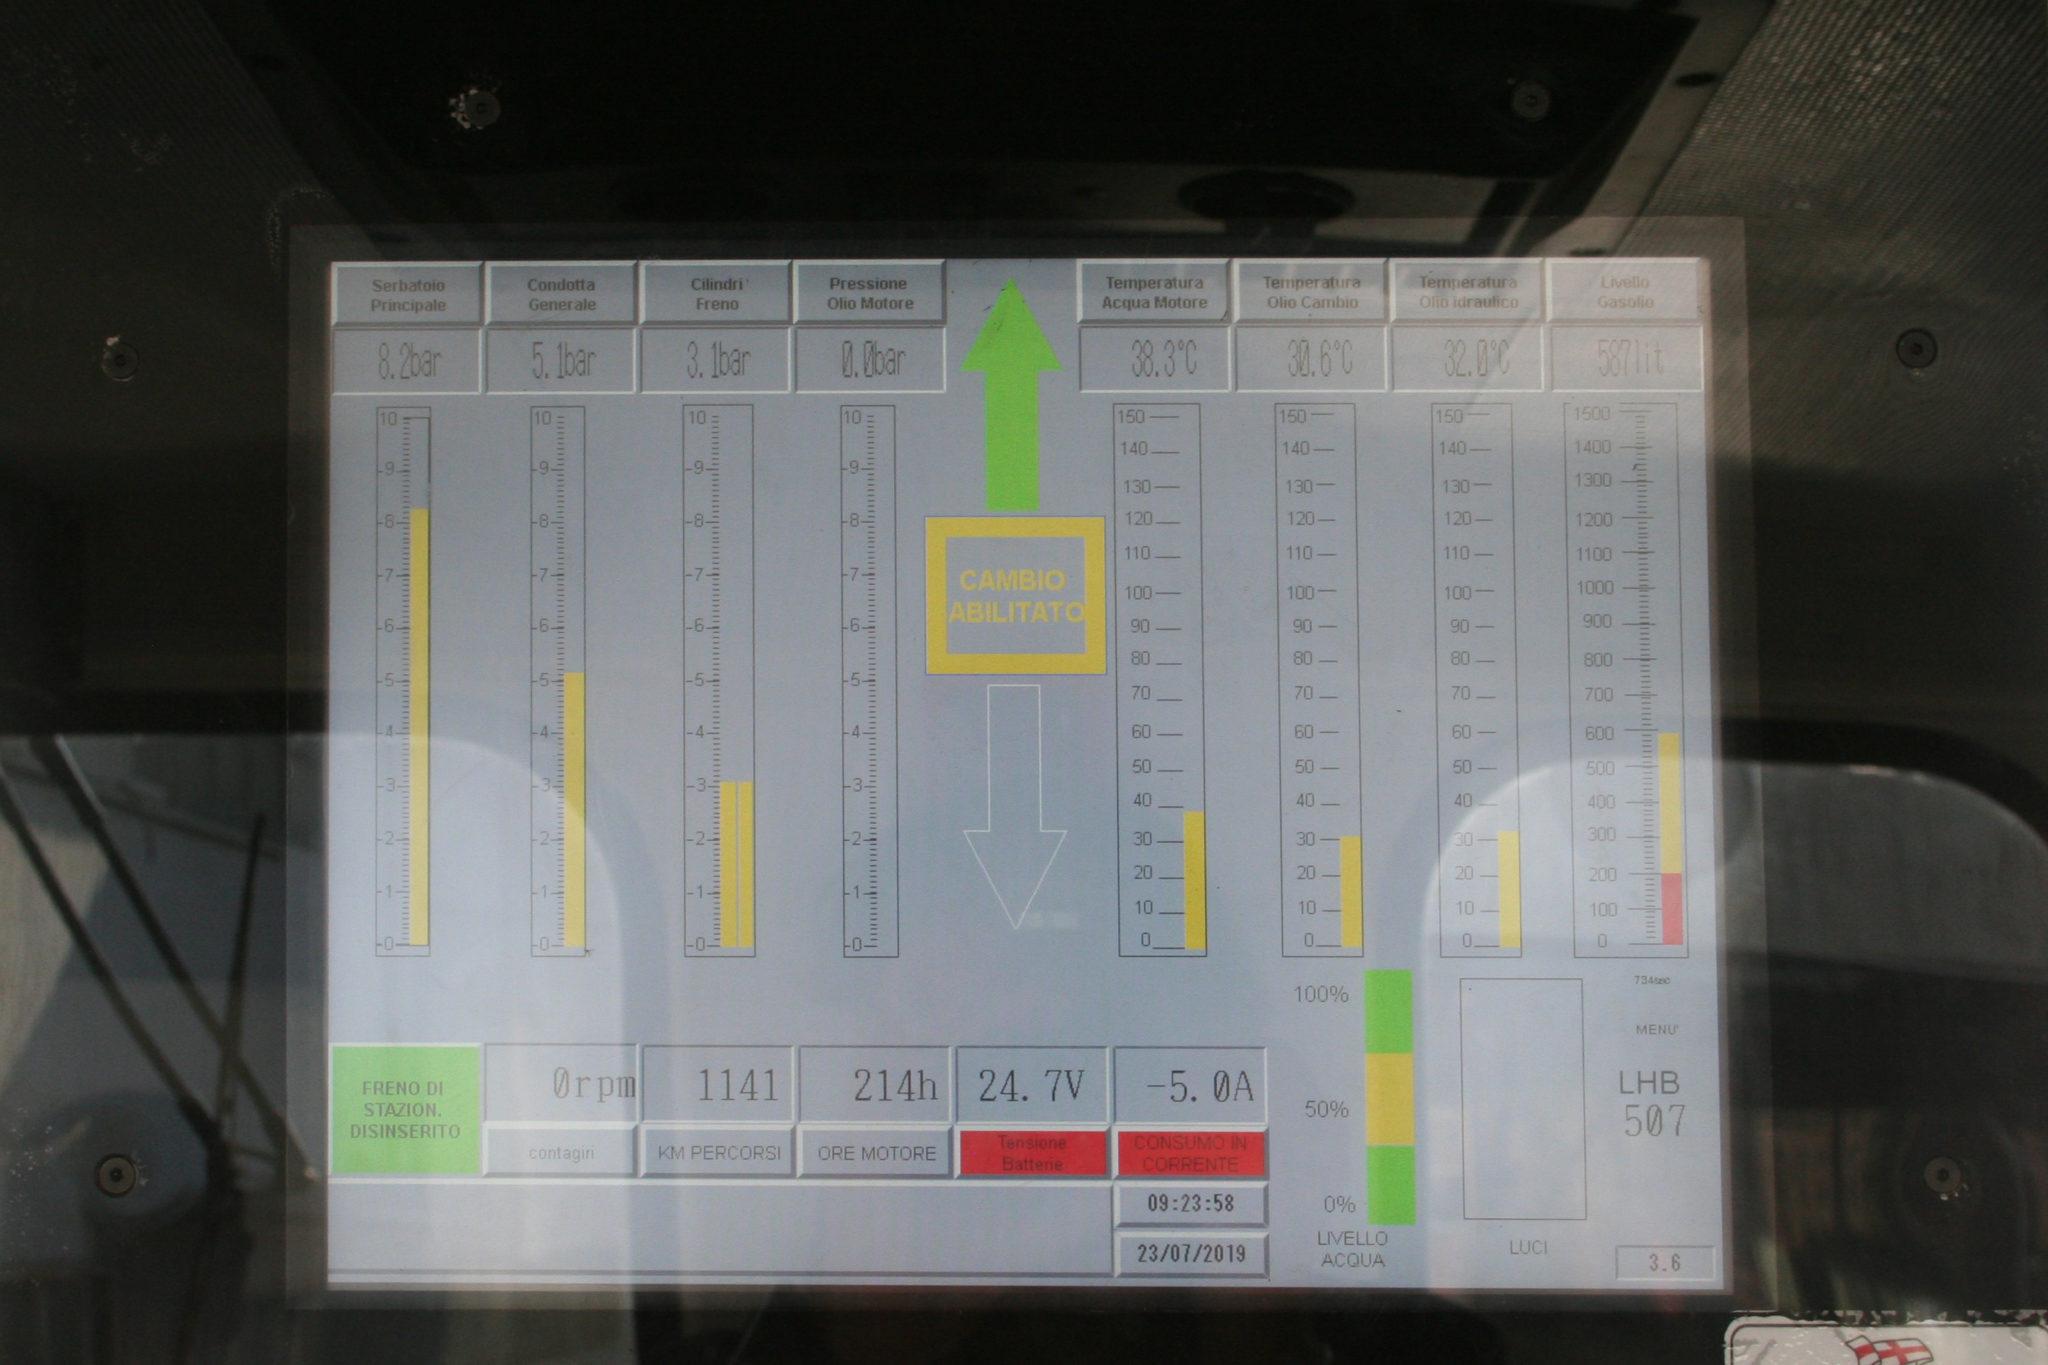 Quadro touchscreen LHB